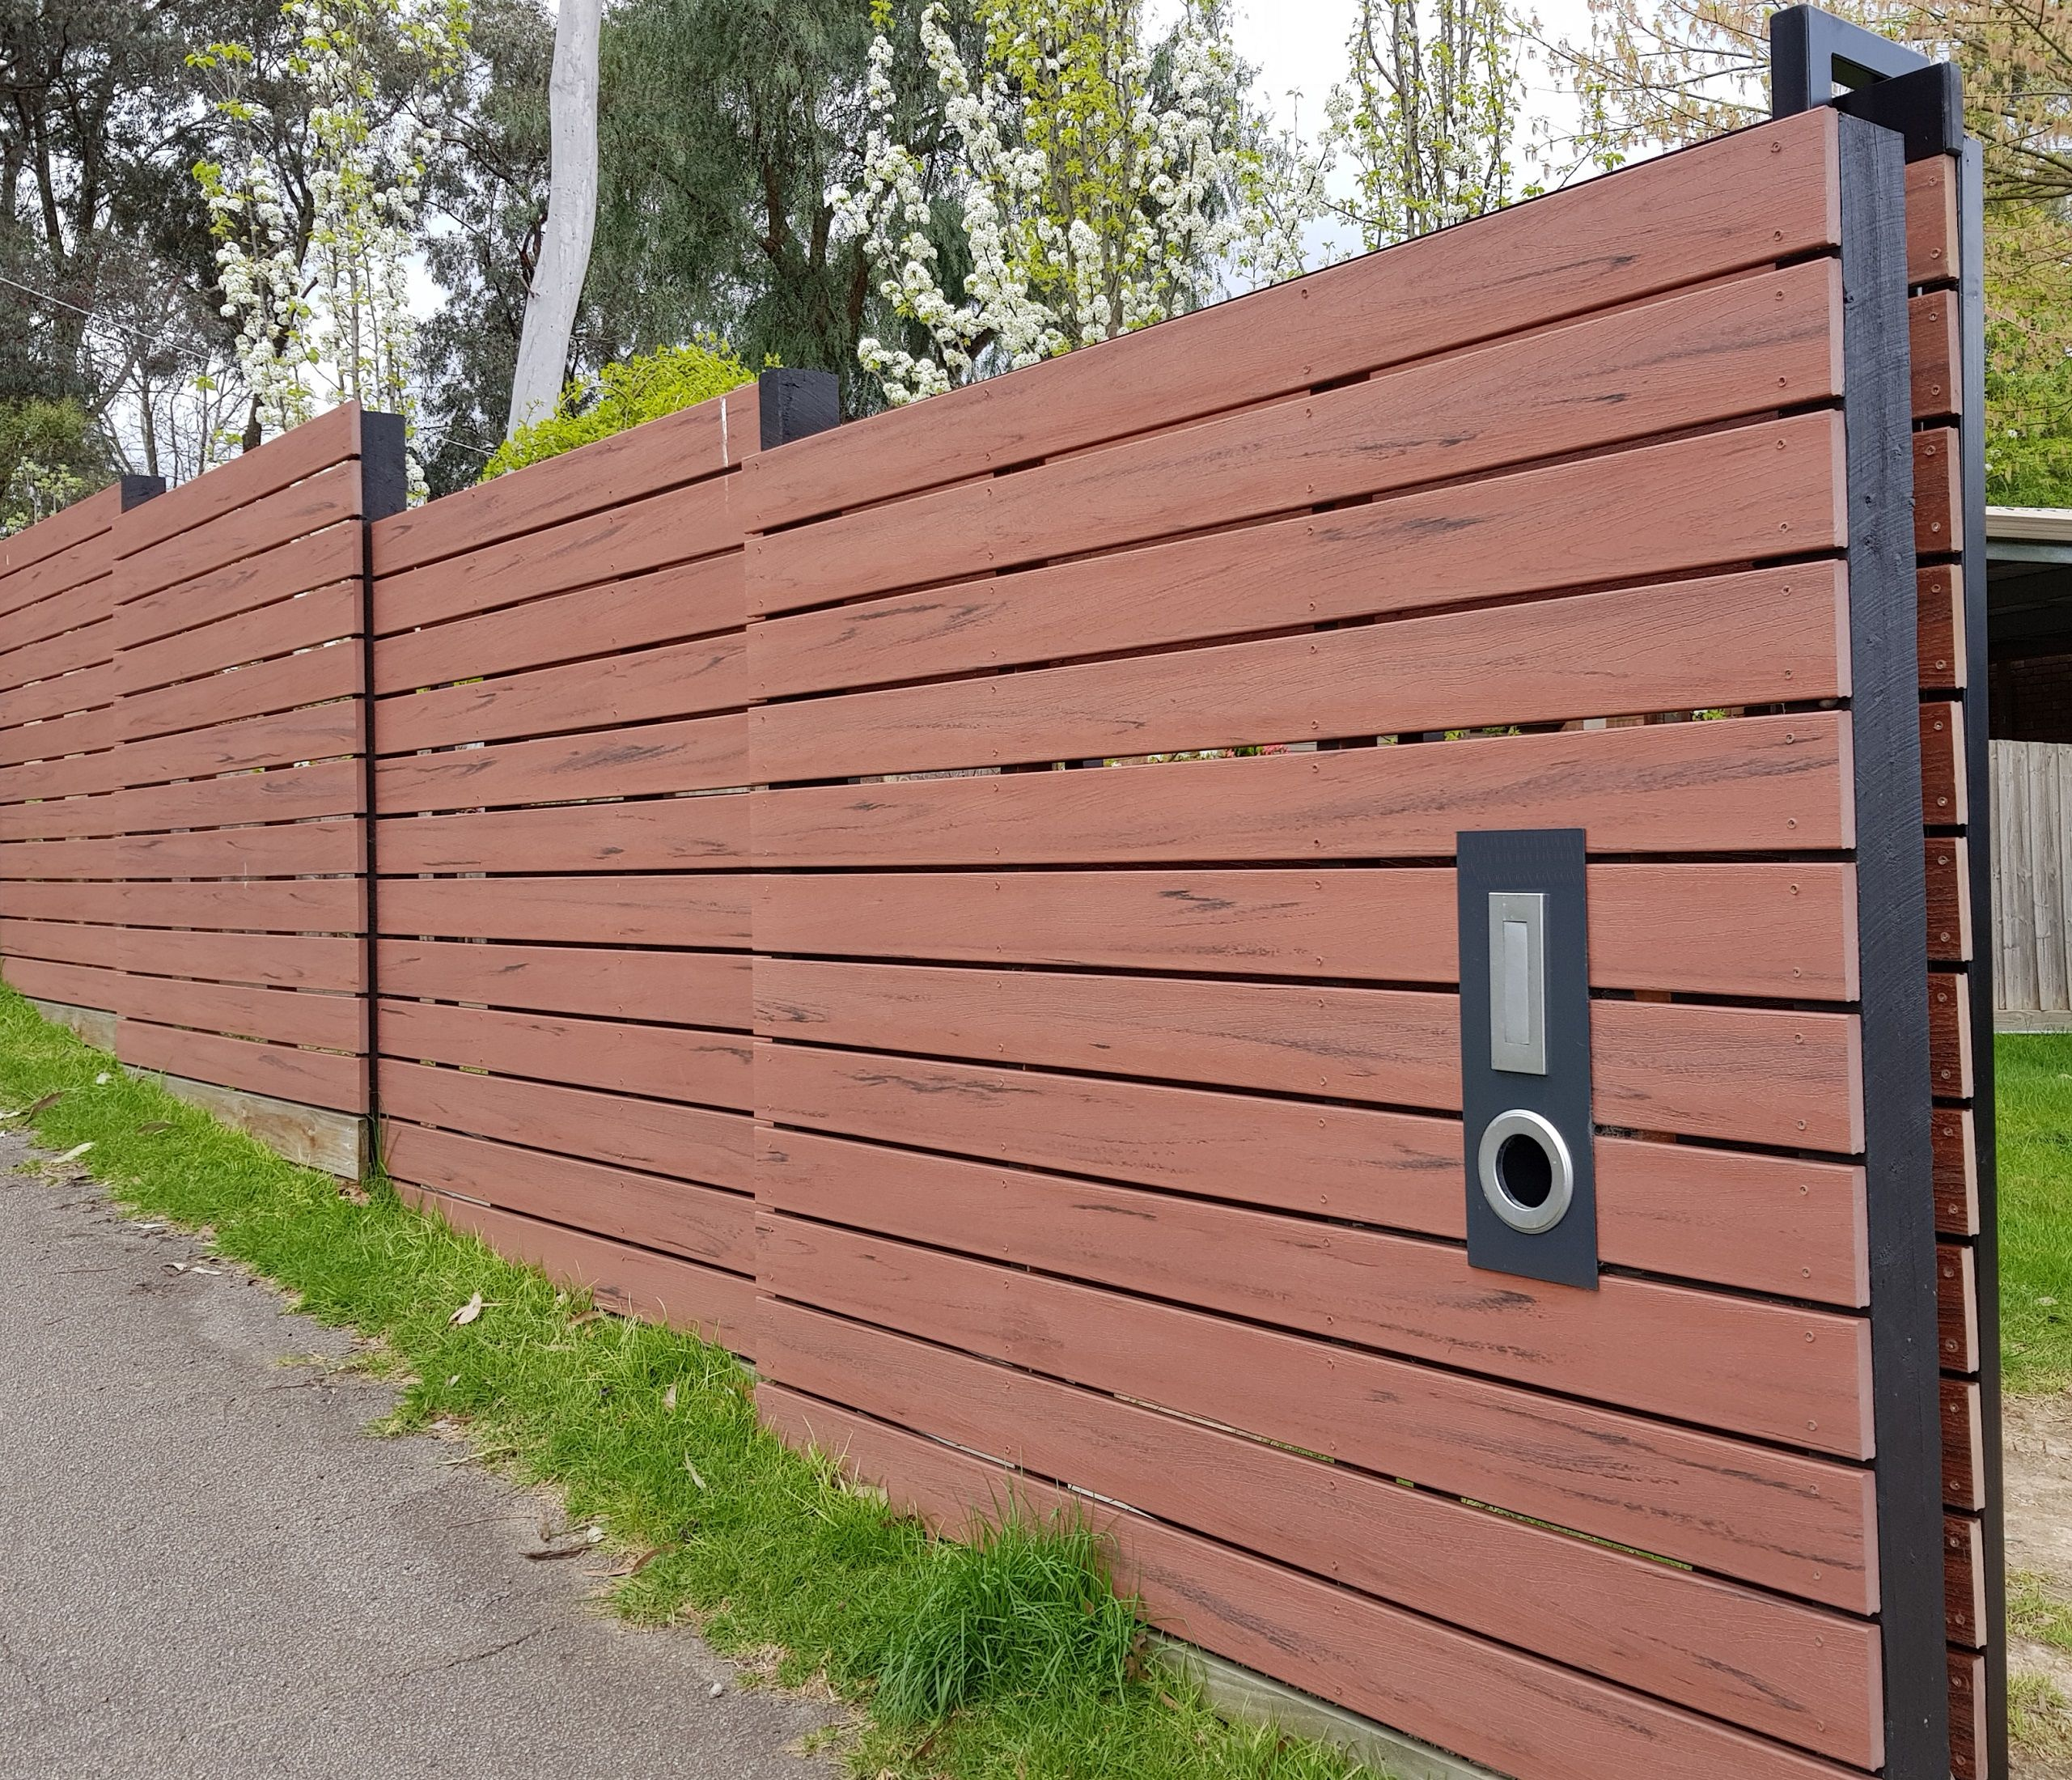 Jarrah no see through screen ModWood Screen Fence